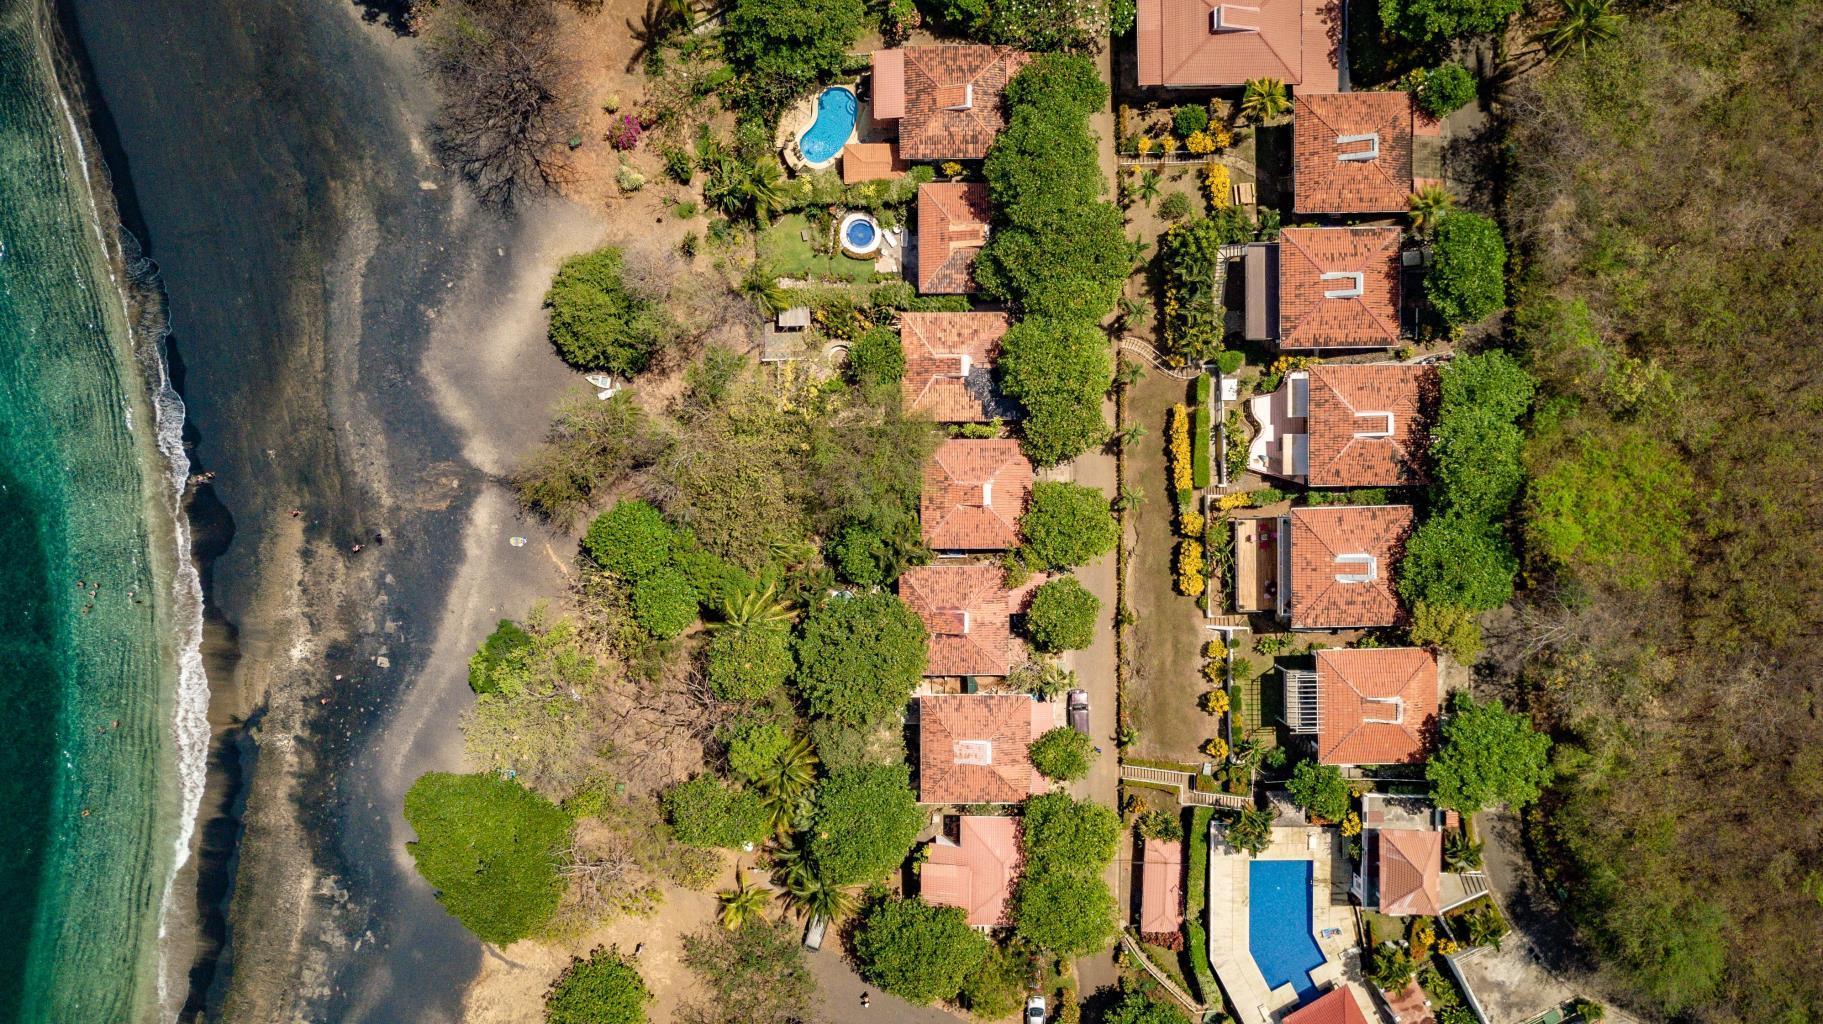 Aerial view of the Playa Ocotal region